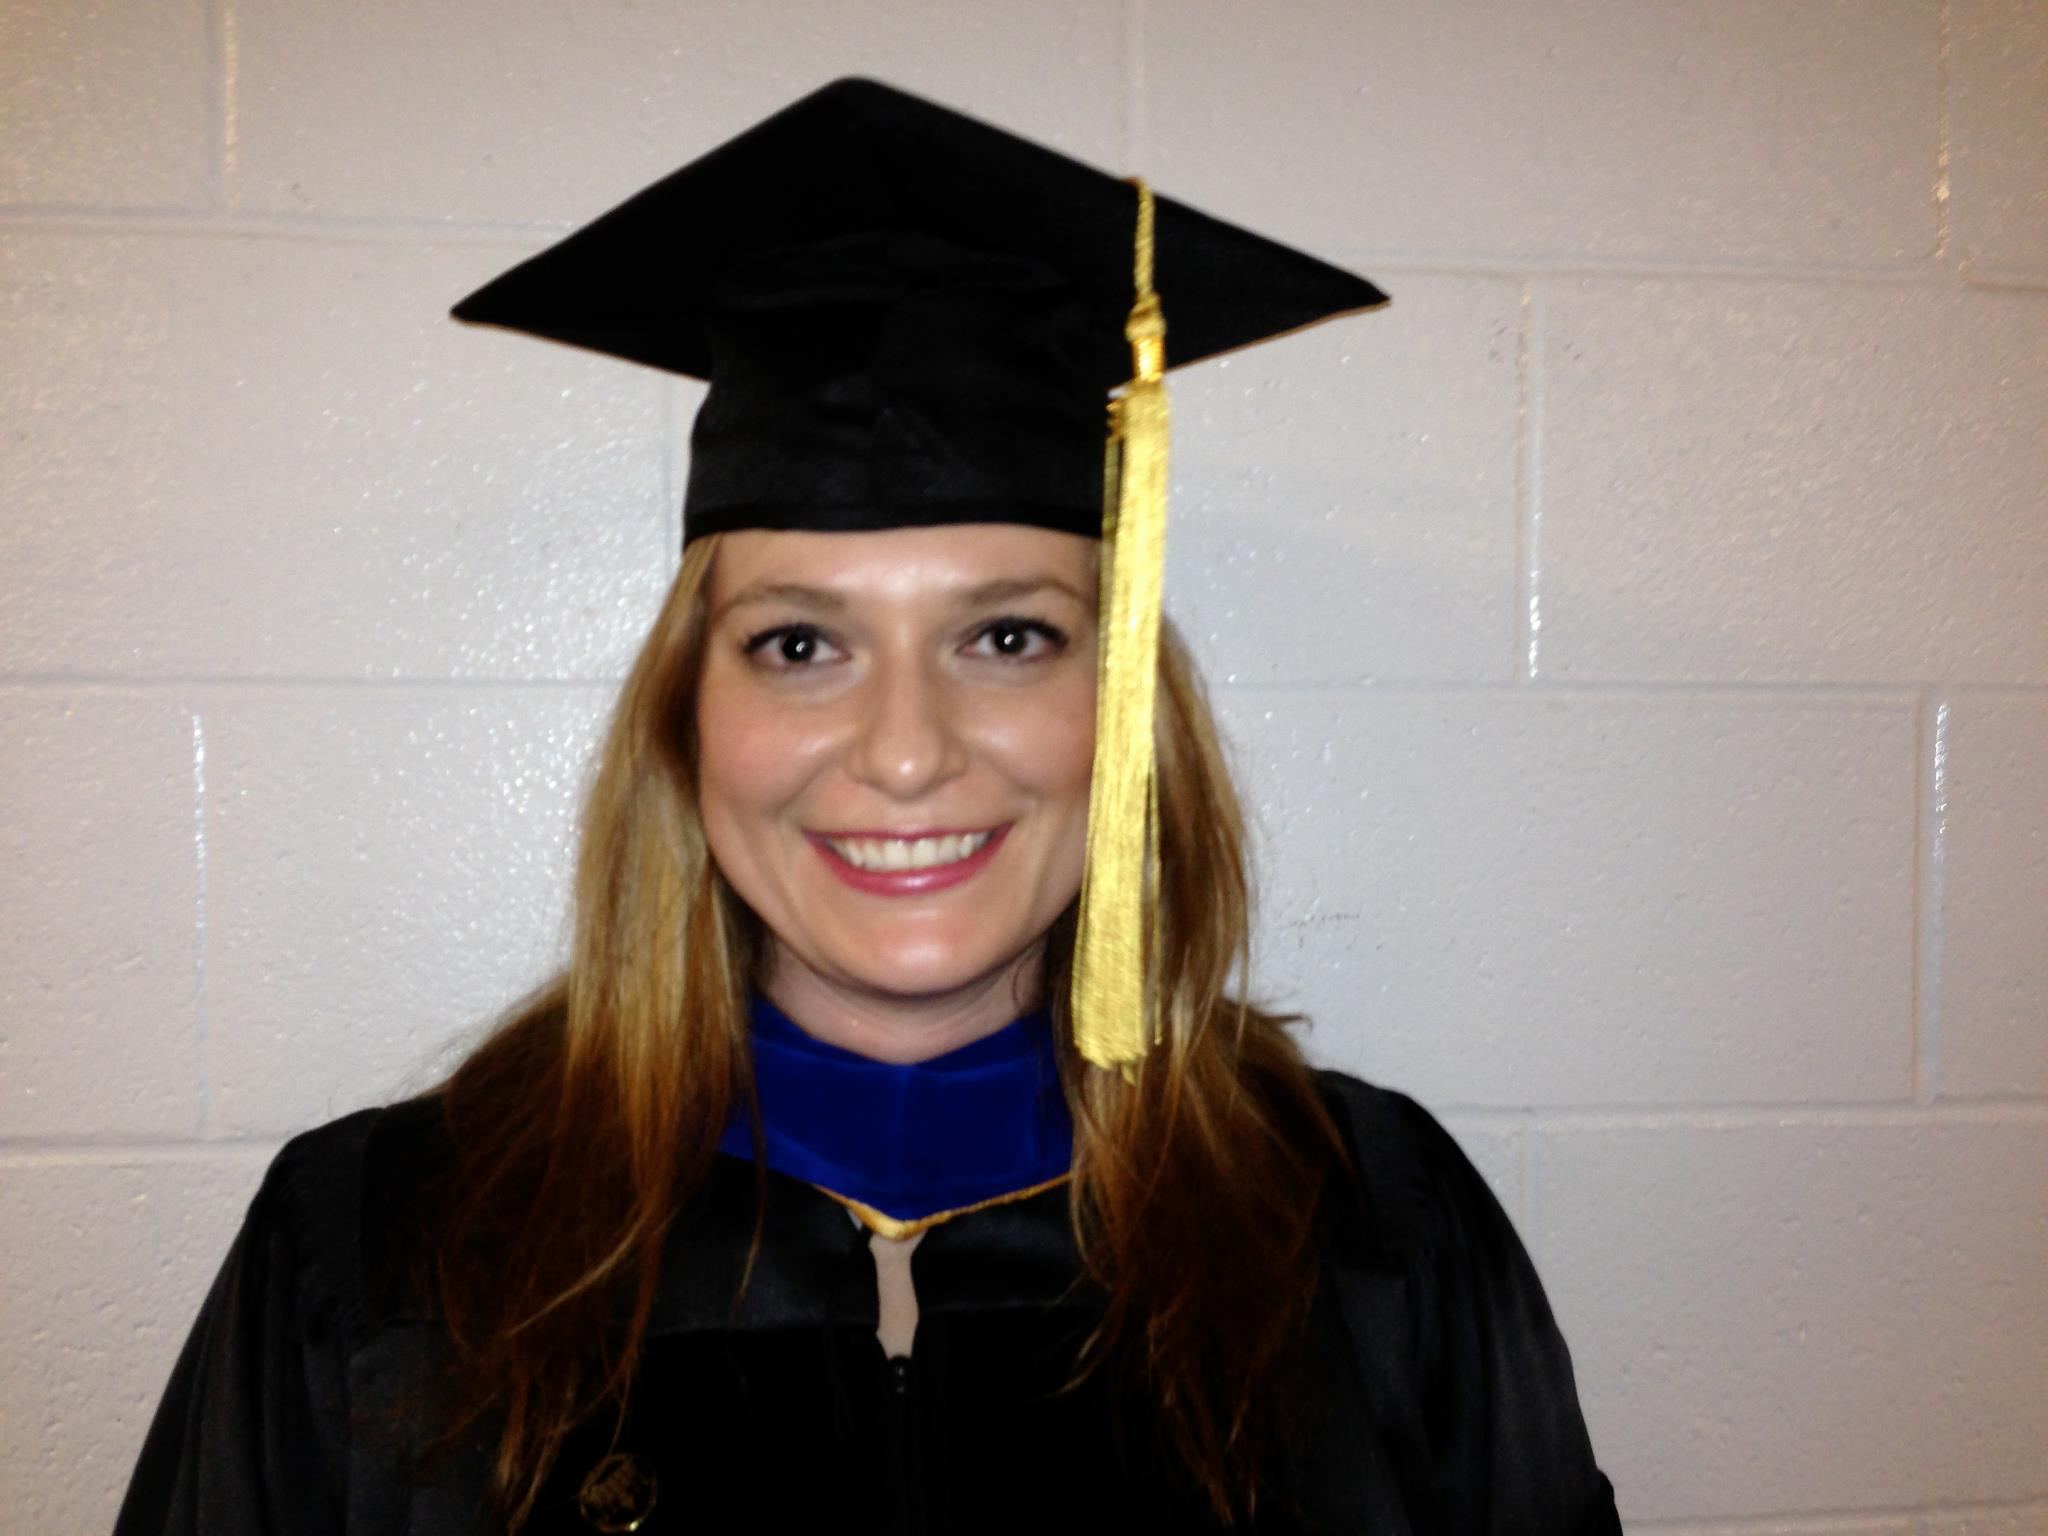 Wildlife Biology Graduate Programs: Master's or Ph.D.?